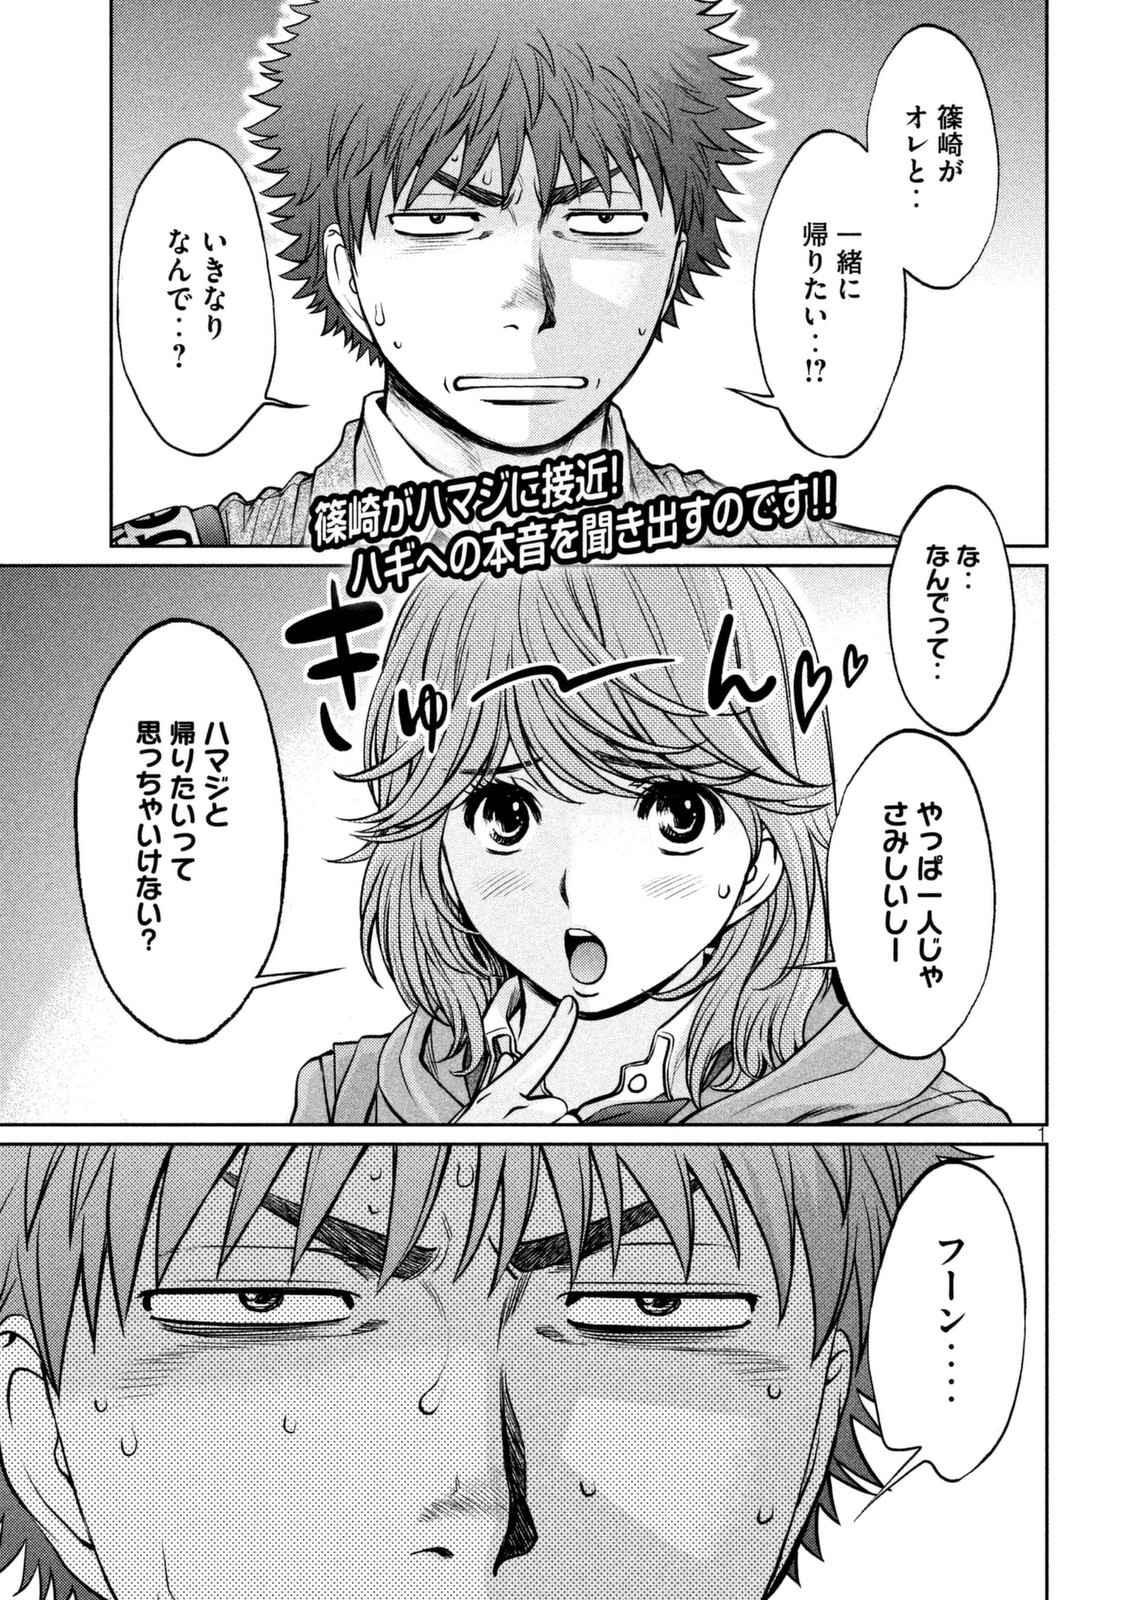 Hantsu_x_Trash Chapter 143 Page 1